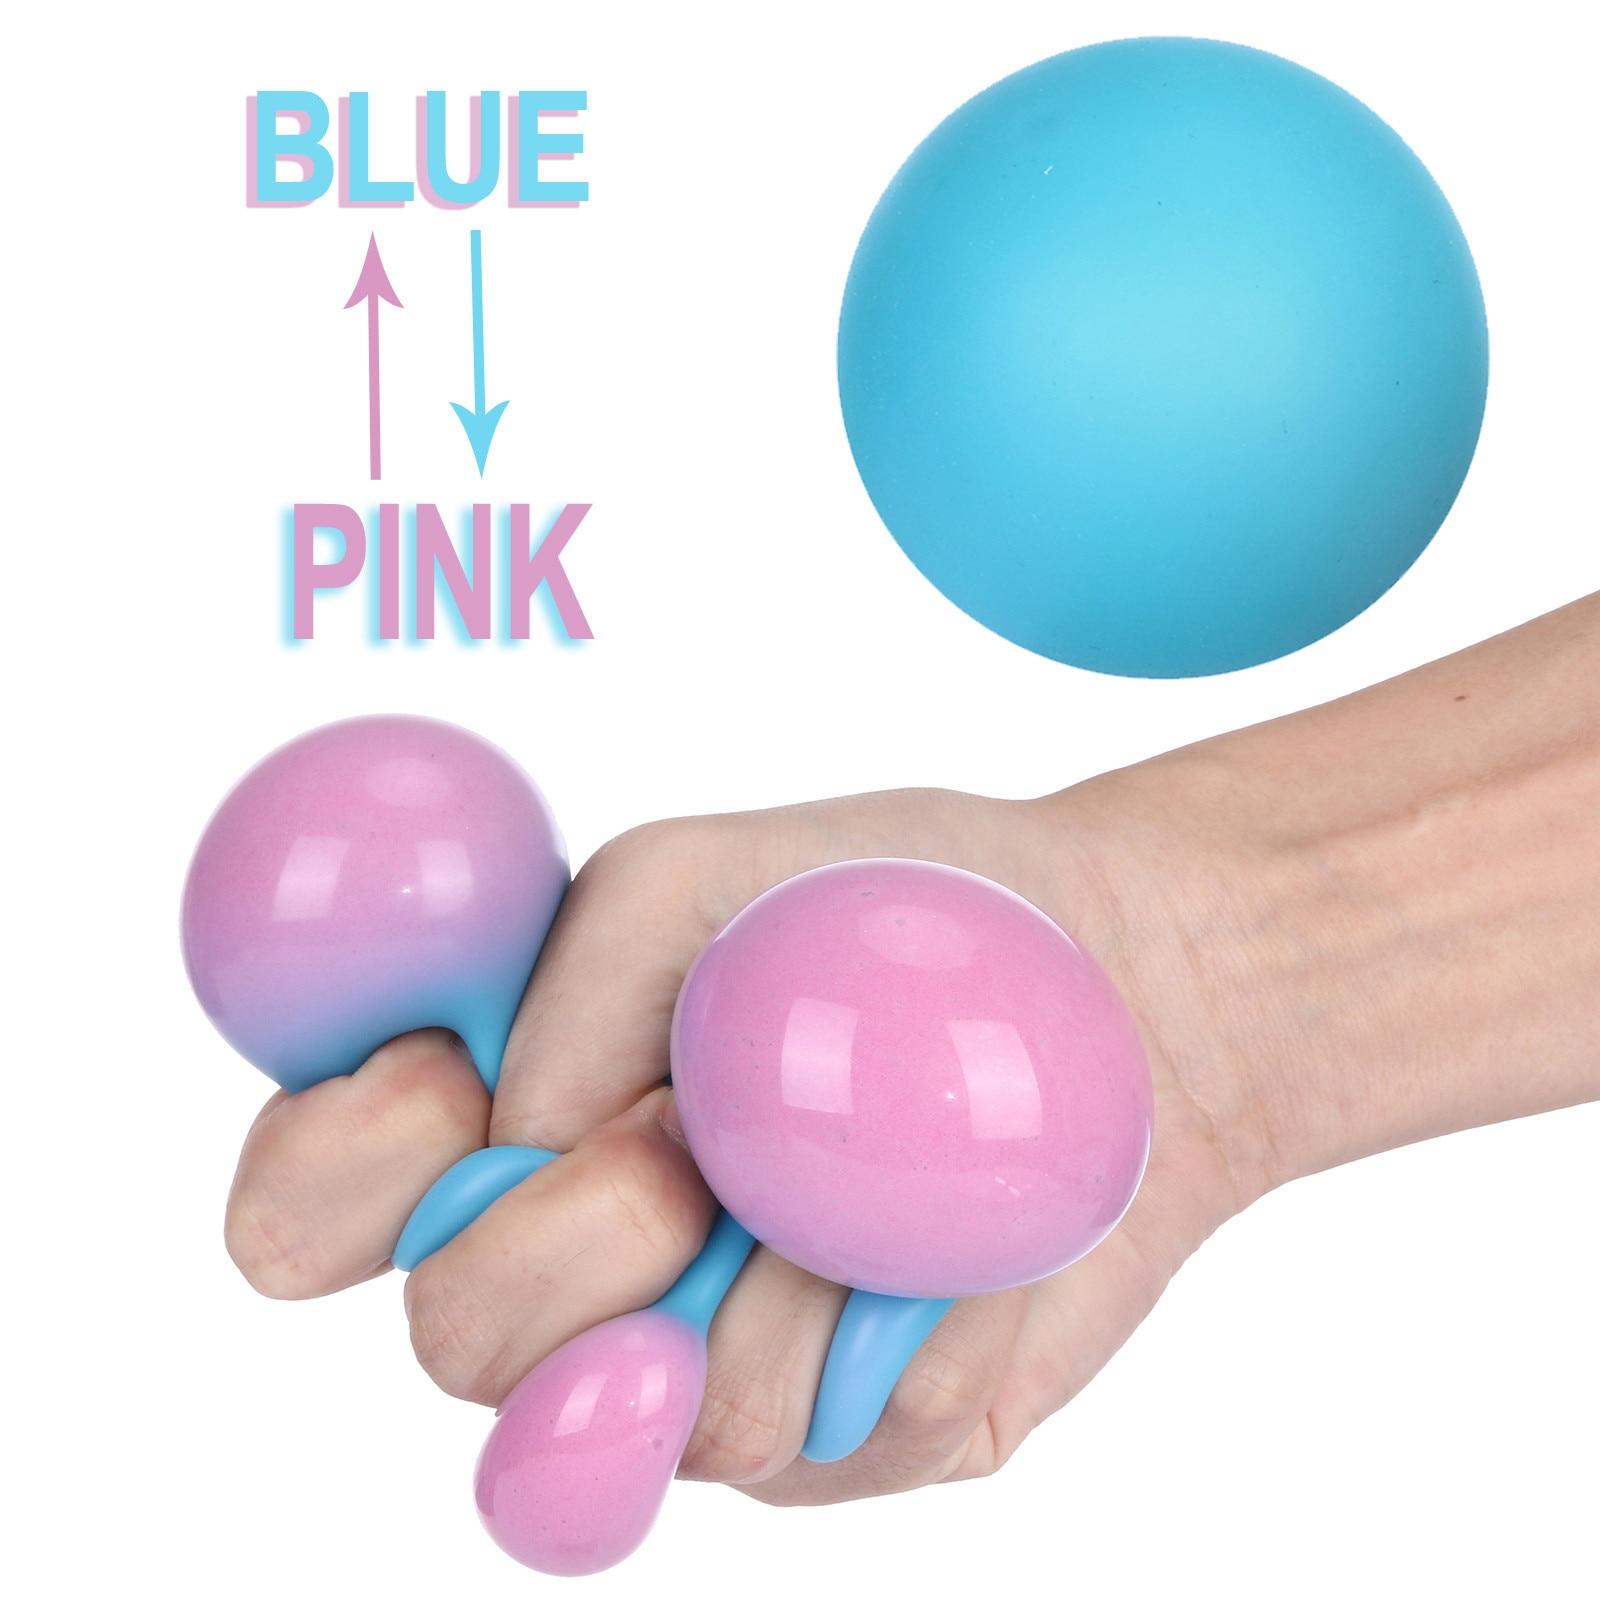 Kids Antistress Toys Colorful Wreak Ball Discolor Children Anti Stress Flour Balls Hand Squeeze Fidget Toys For Child Adult 18